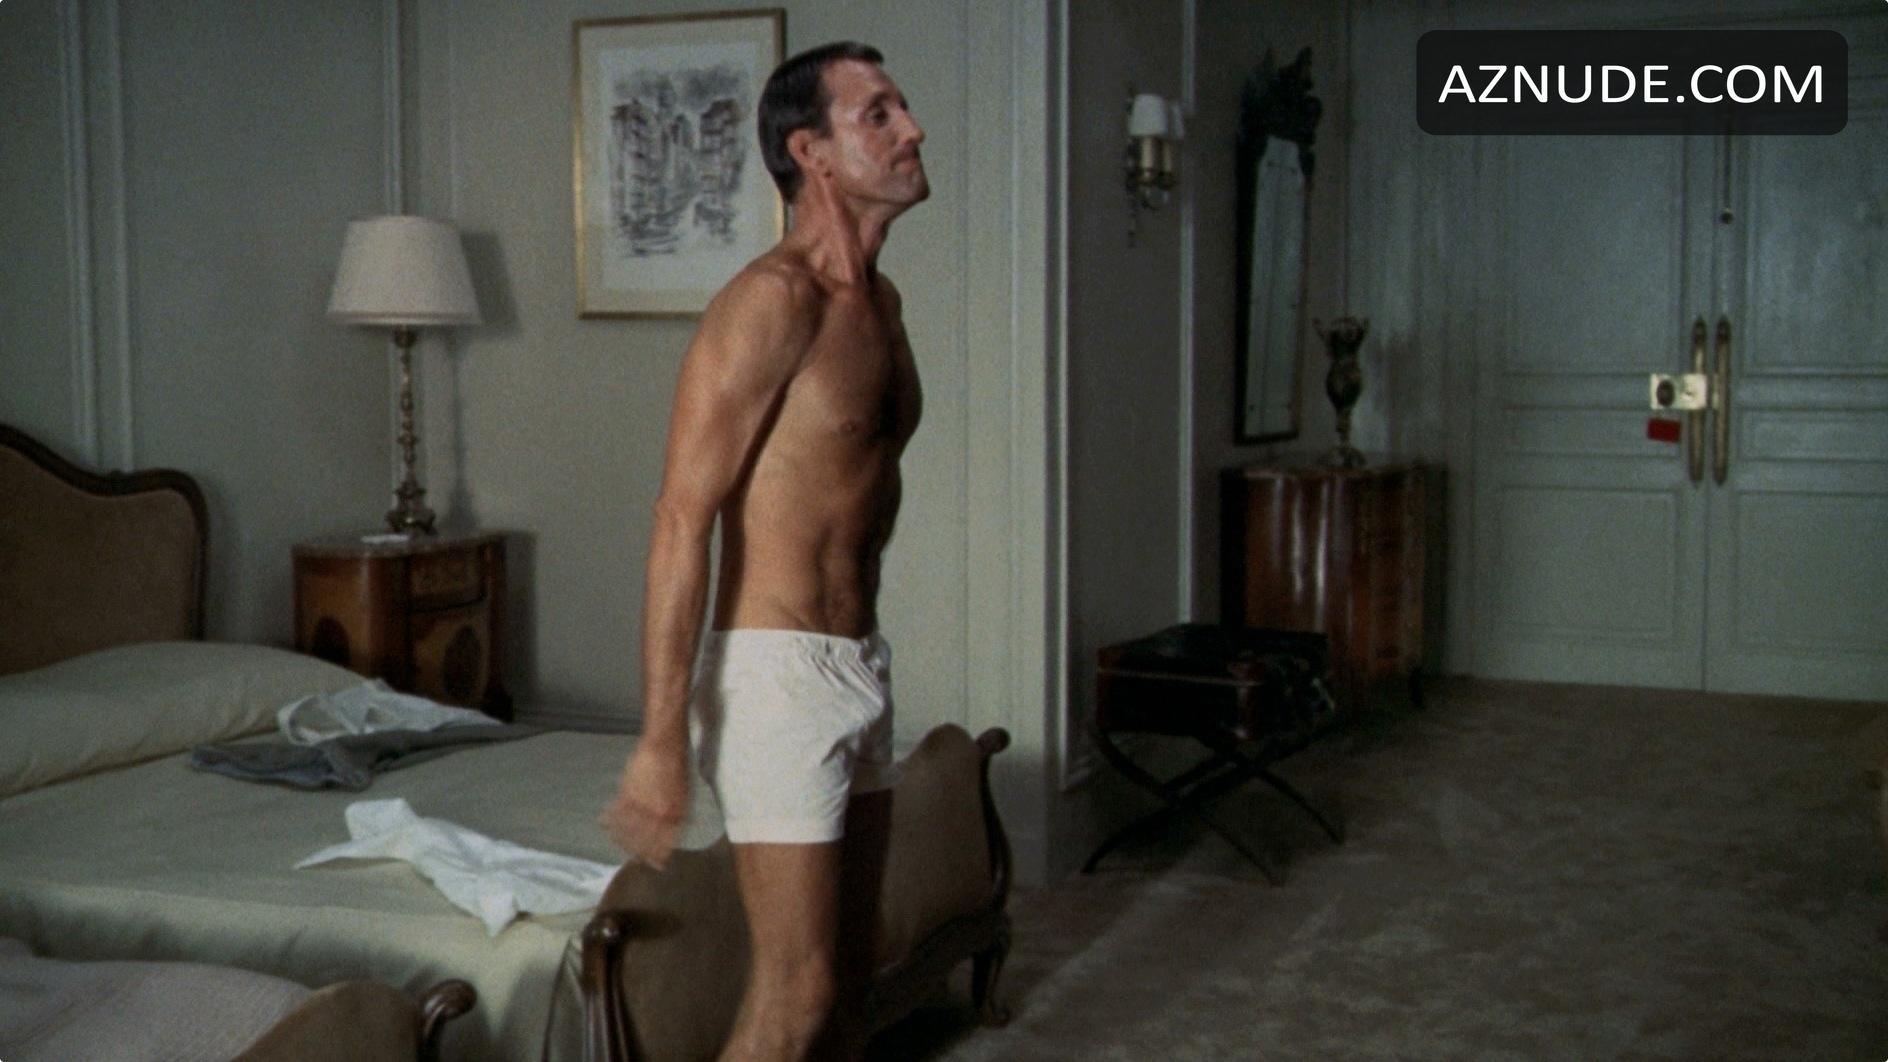 photo of nude man